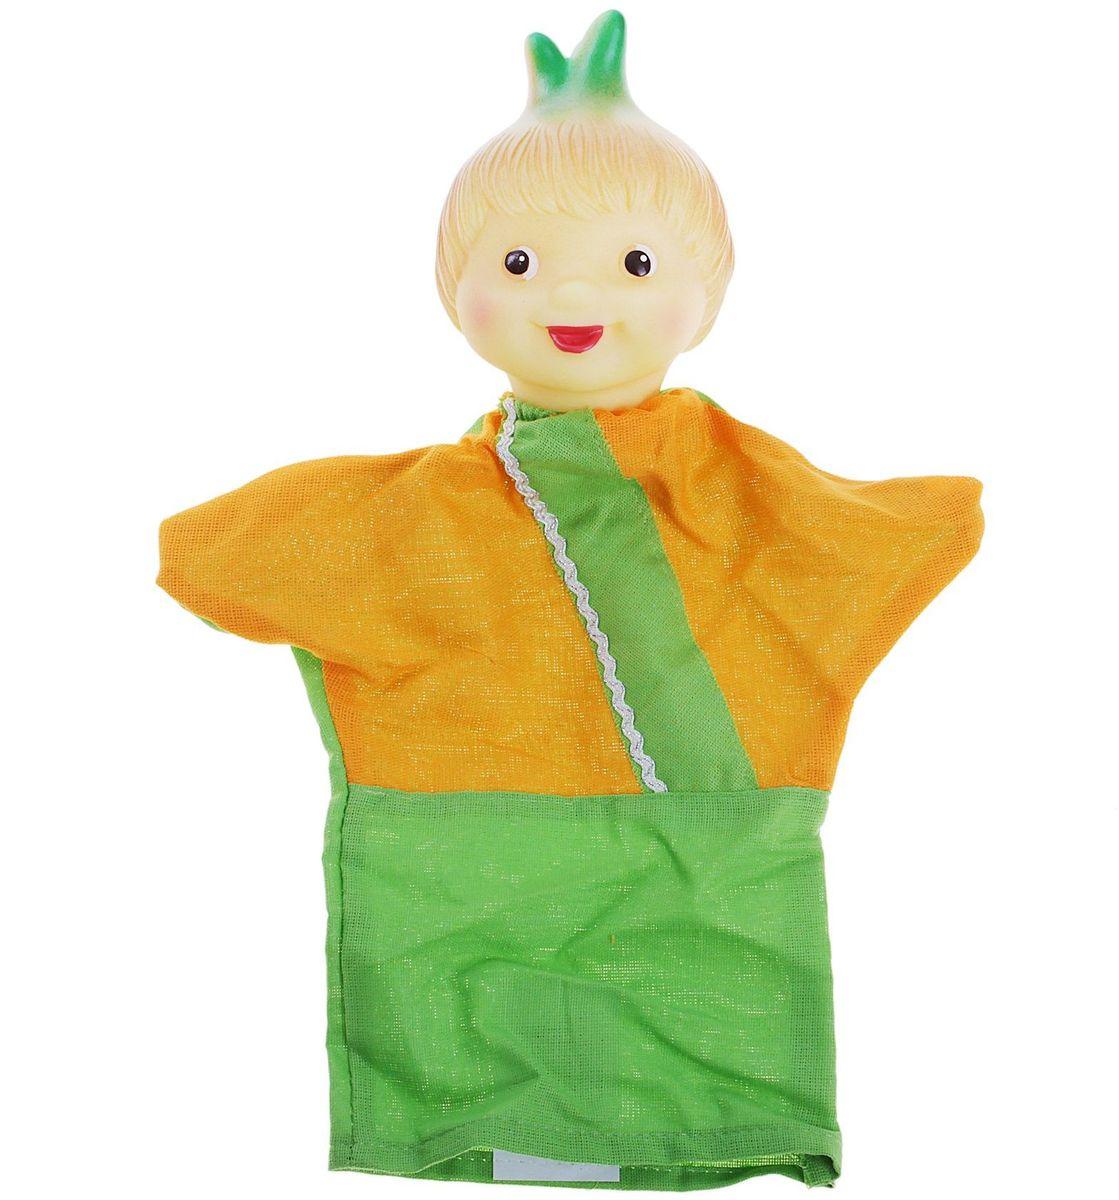 Sima-land Мягкая игрушка на руку Чиполлино 722666 sima land мягкая игрушка на руку заяц 506986